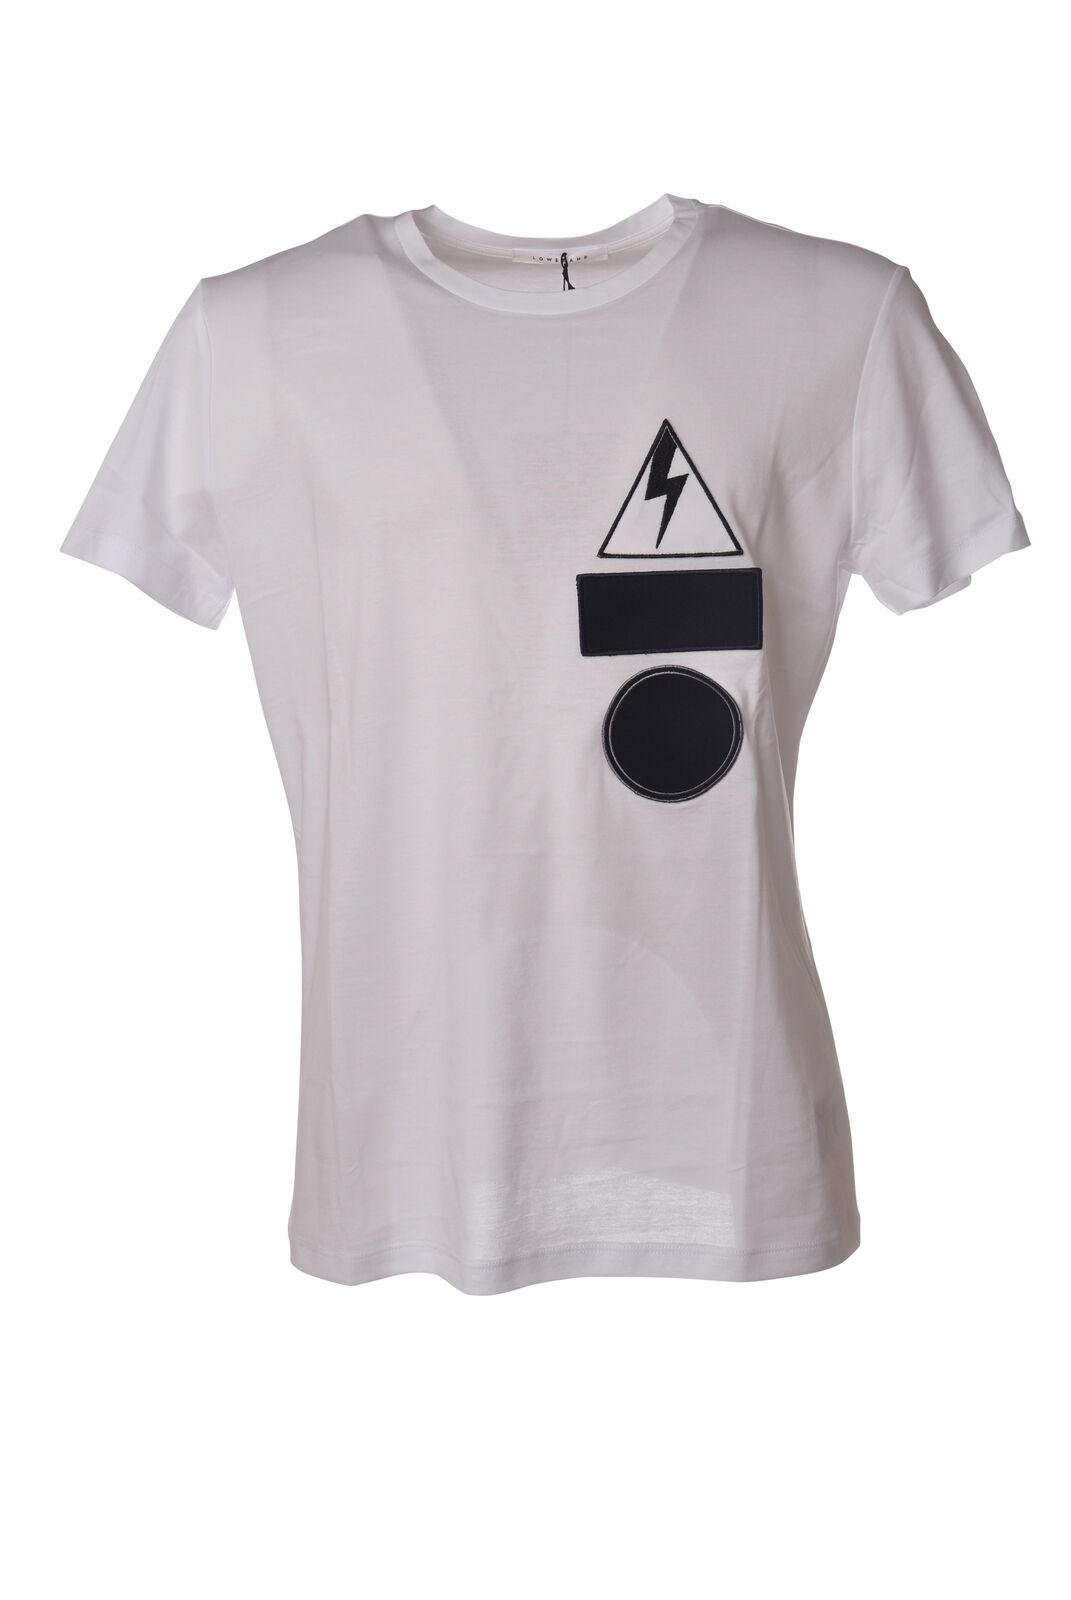 Niedrig Brand - Topwear-T-shirts - Man - Weiß - 5267520D180028